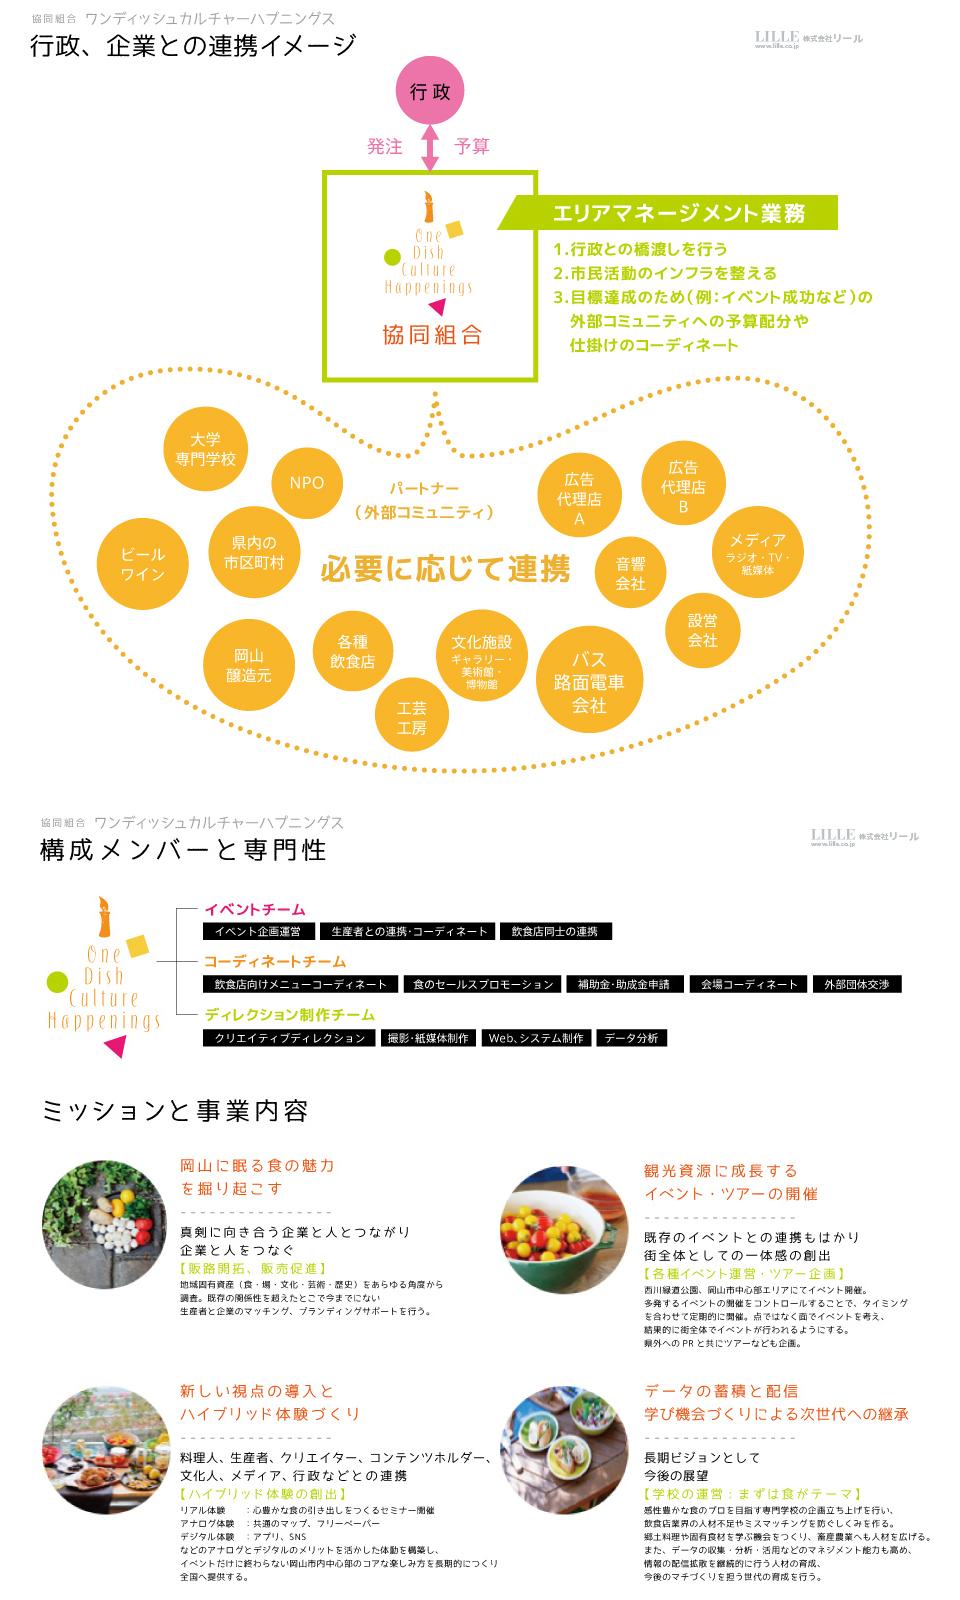 ODCH企画書02_公開用